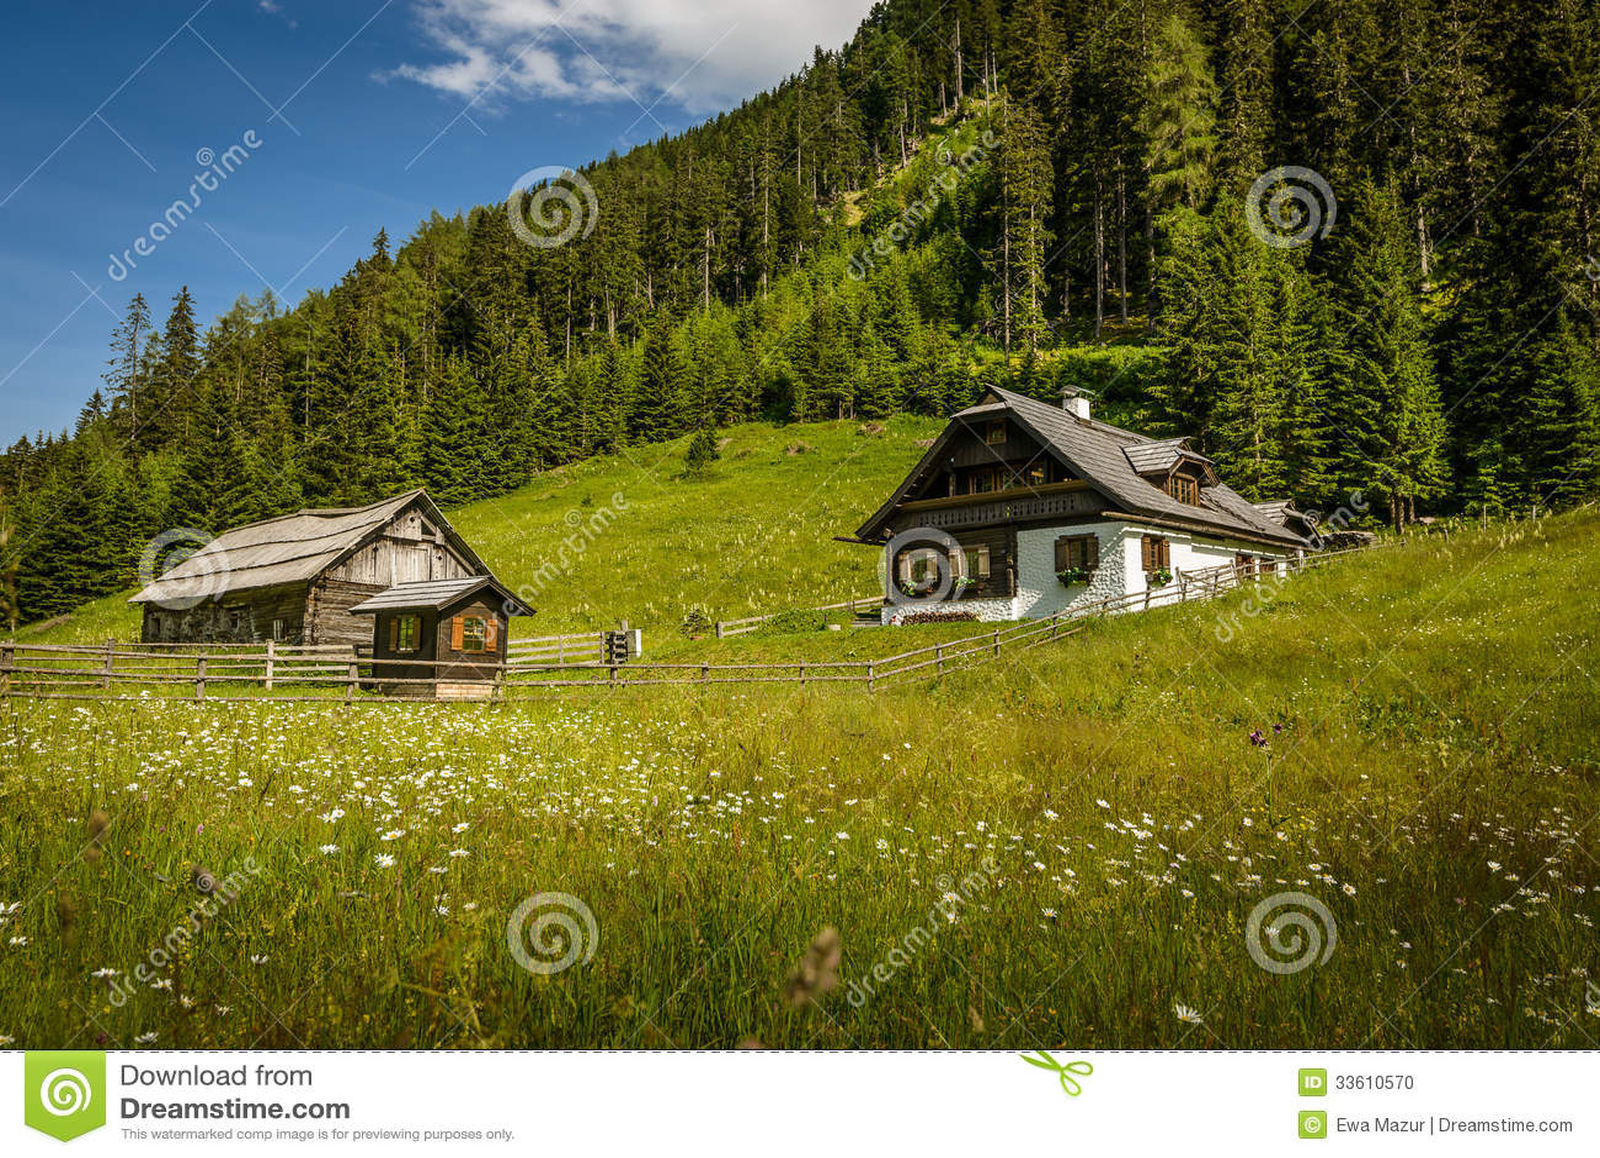 Alpine House Stock Photo Image 33610570